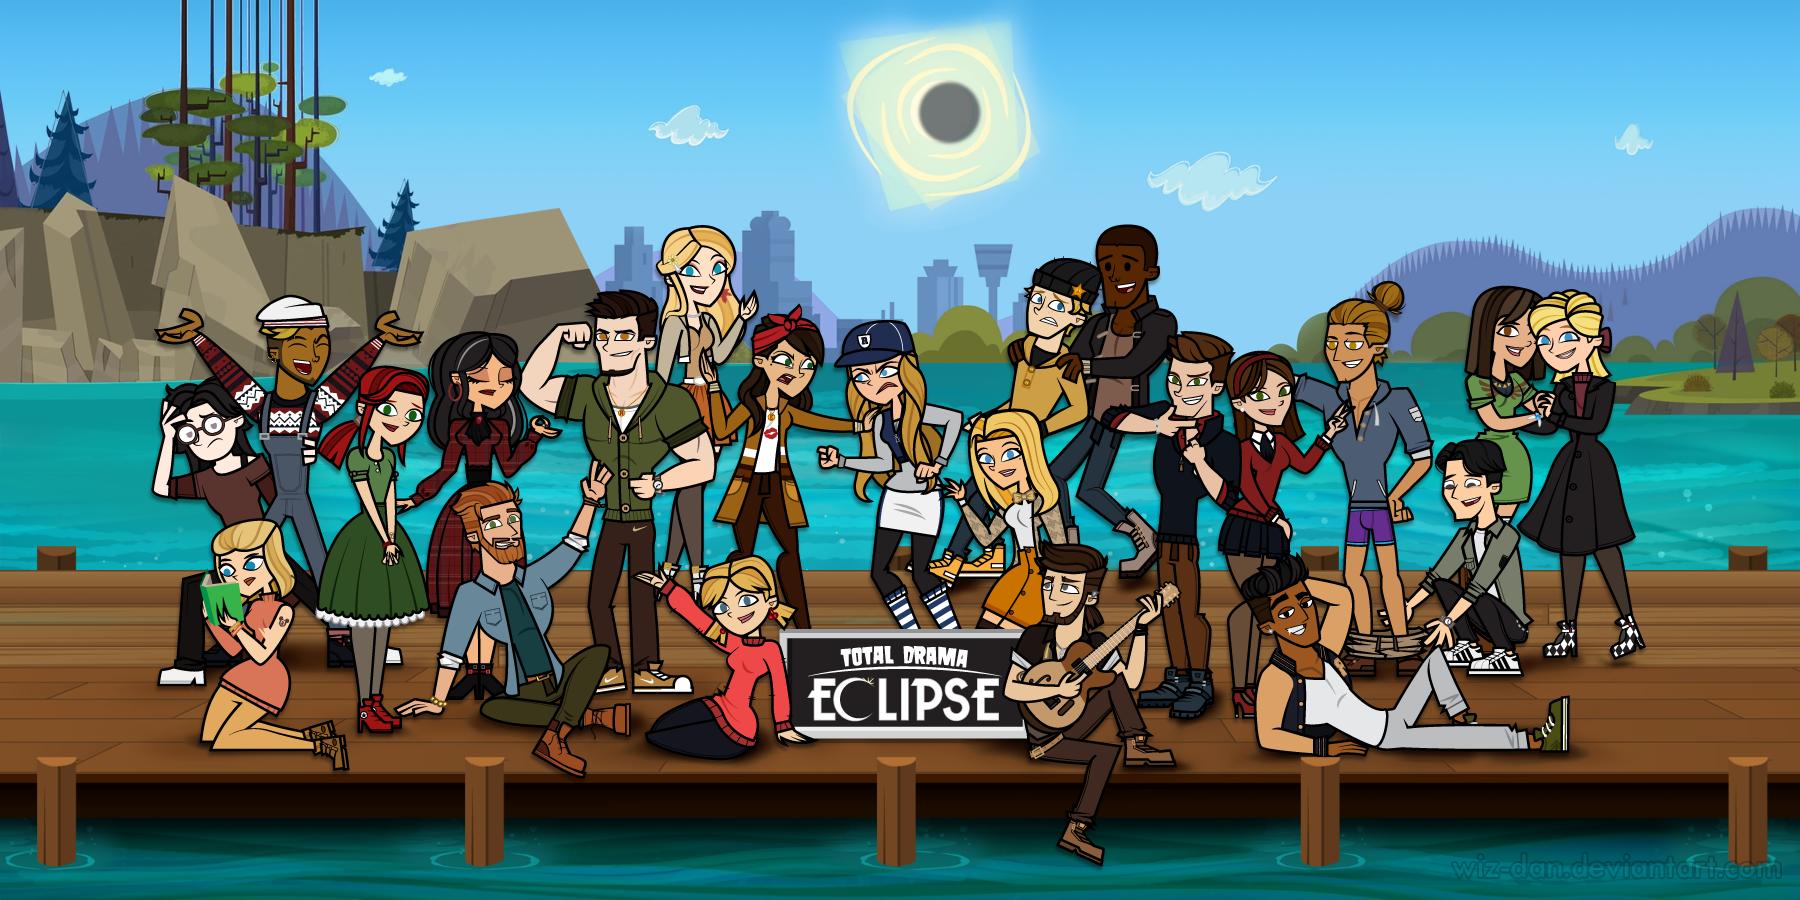 74660803b12 Total Drama Eclipse | Total Drama Island Fanfiction wikia | FANDOM ...